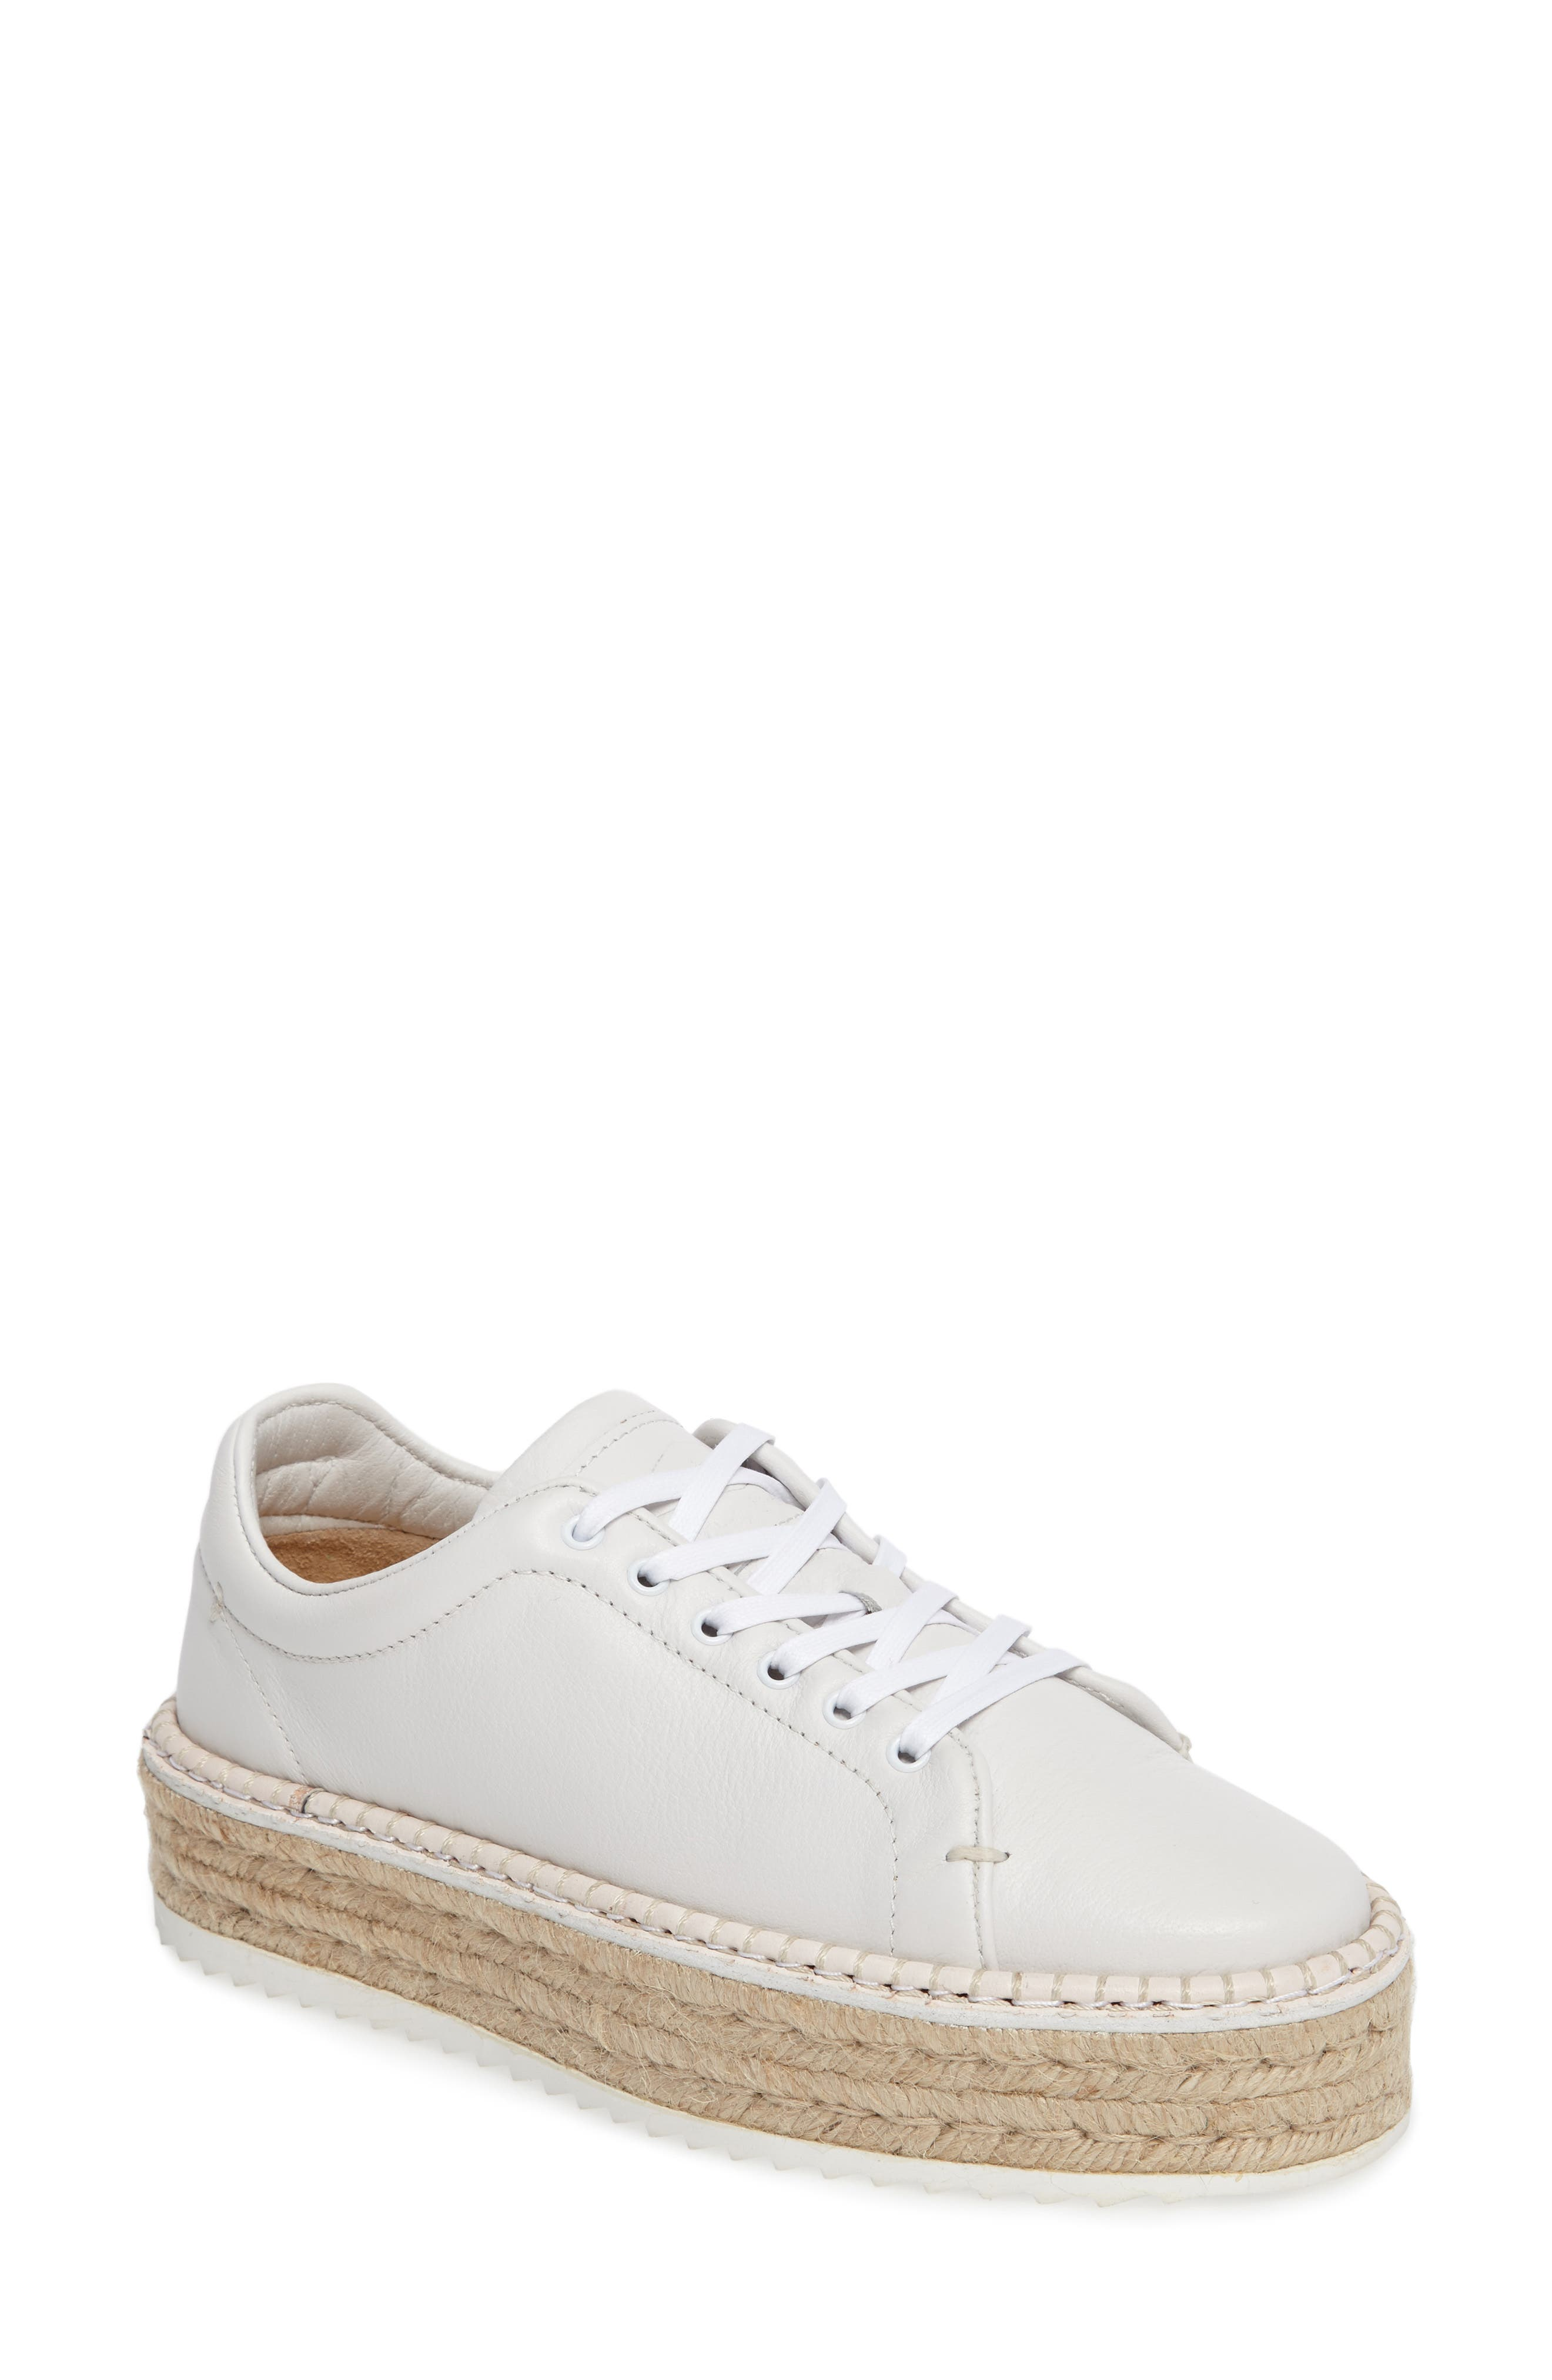 Kent Espadrille Sneaker,                         Main,                         color, 150